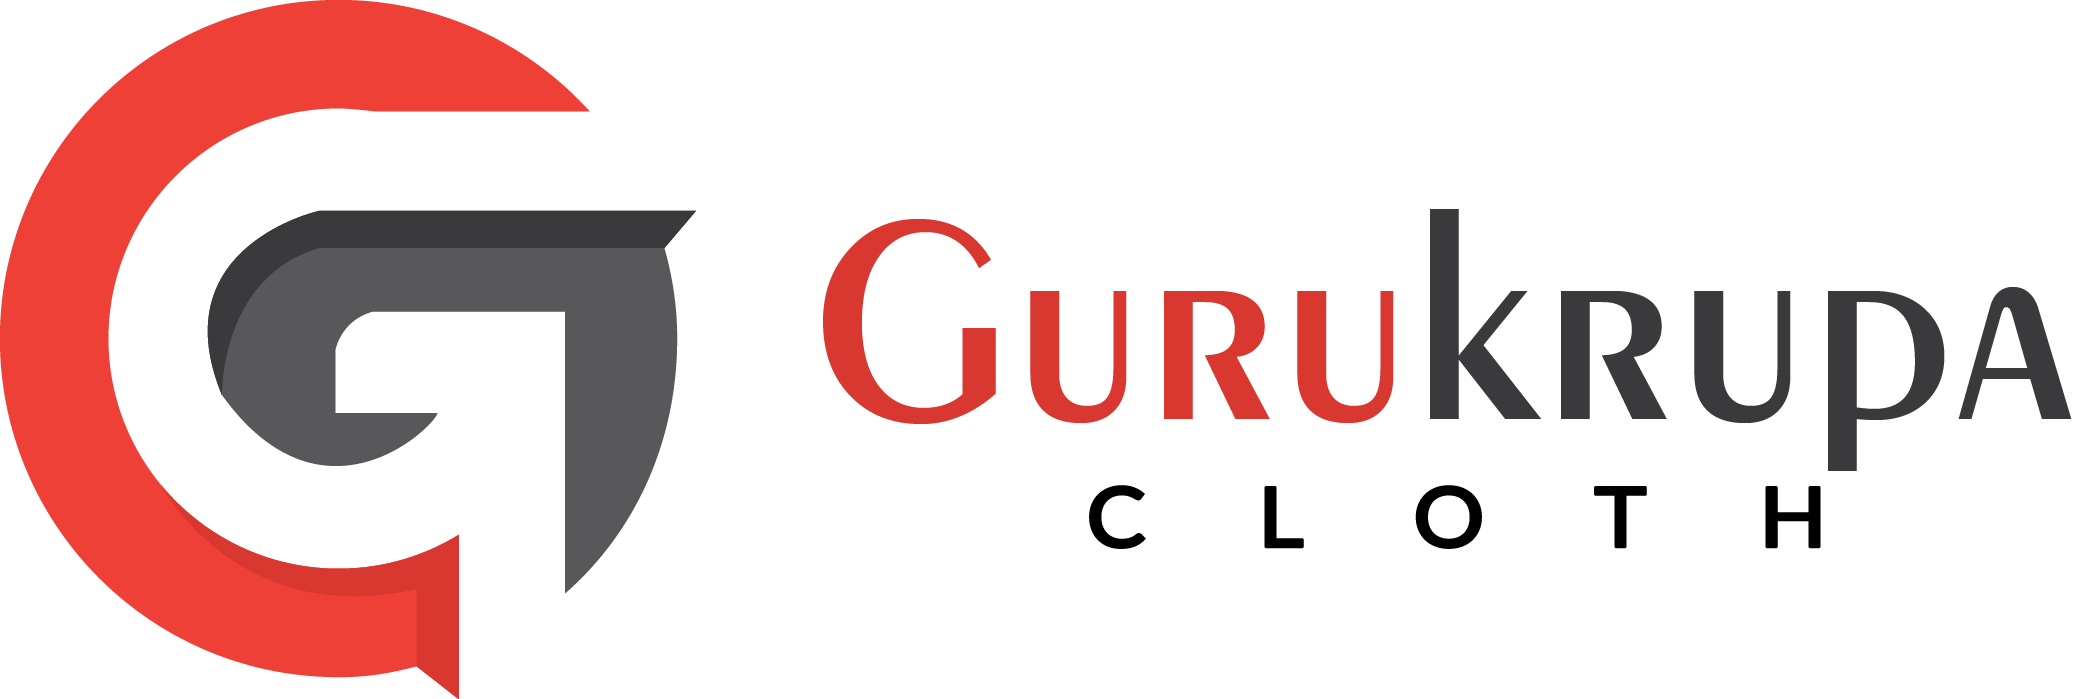 Gurukrupa Clothe